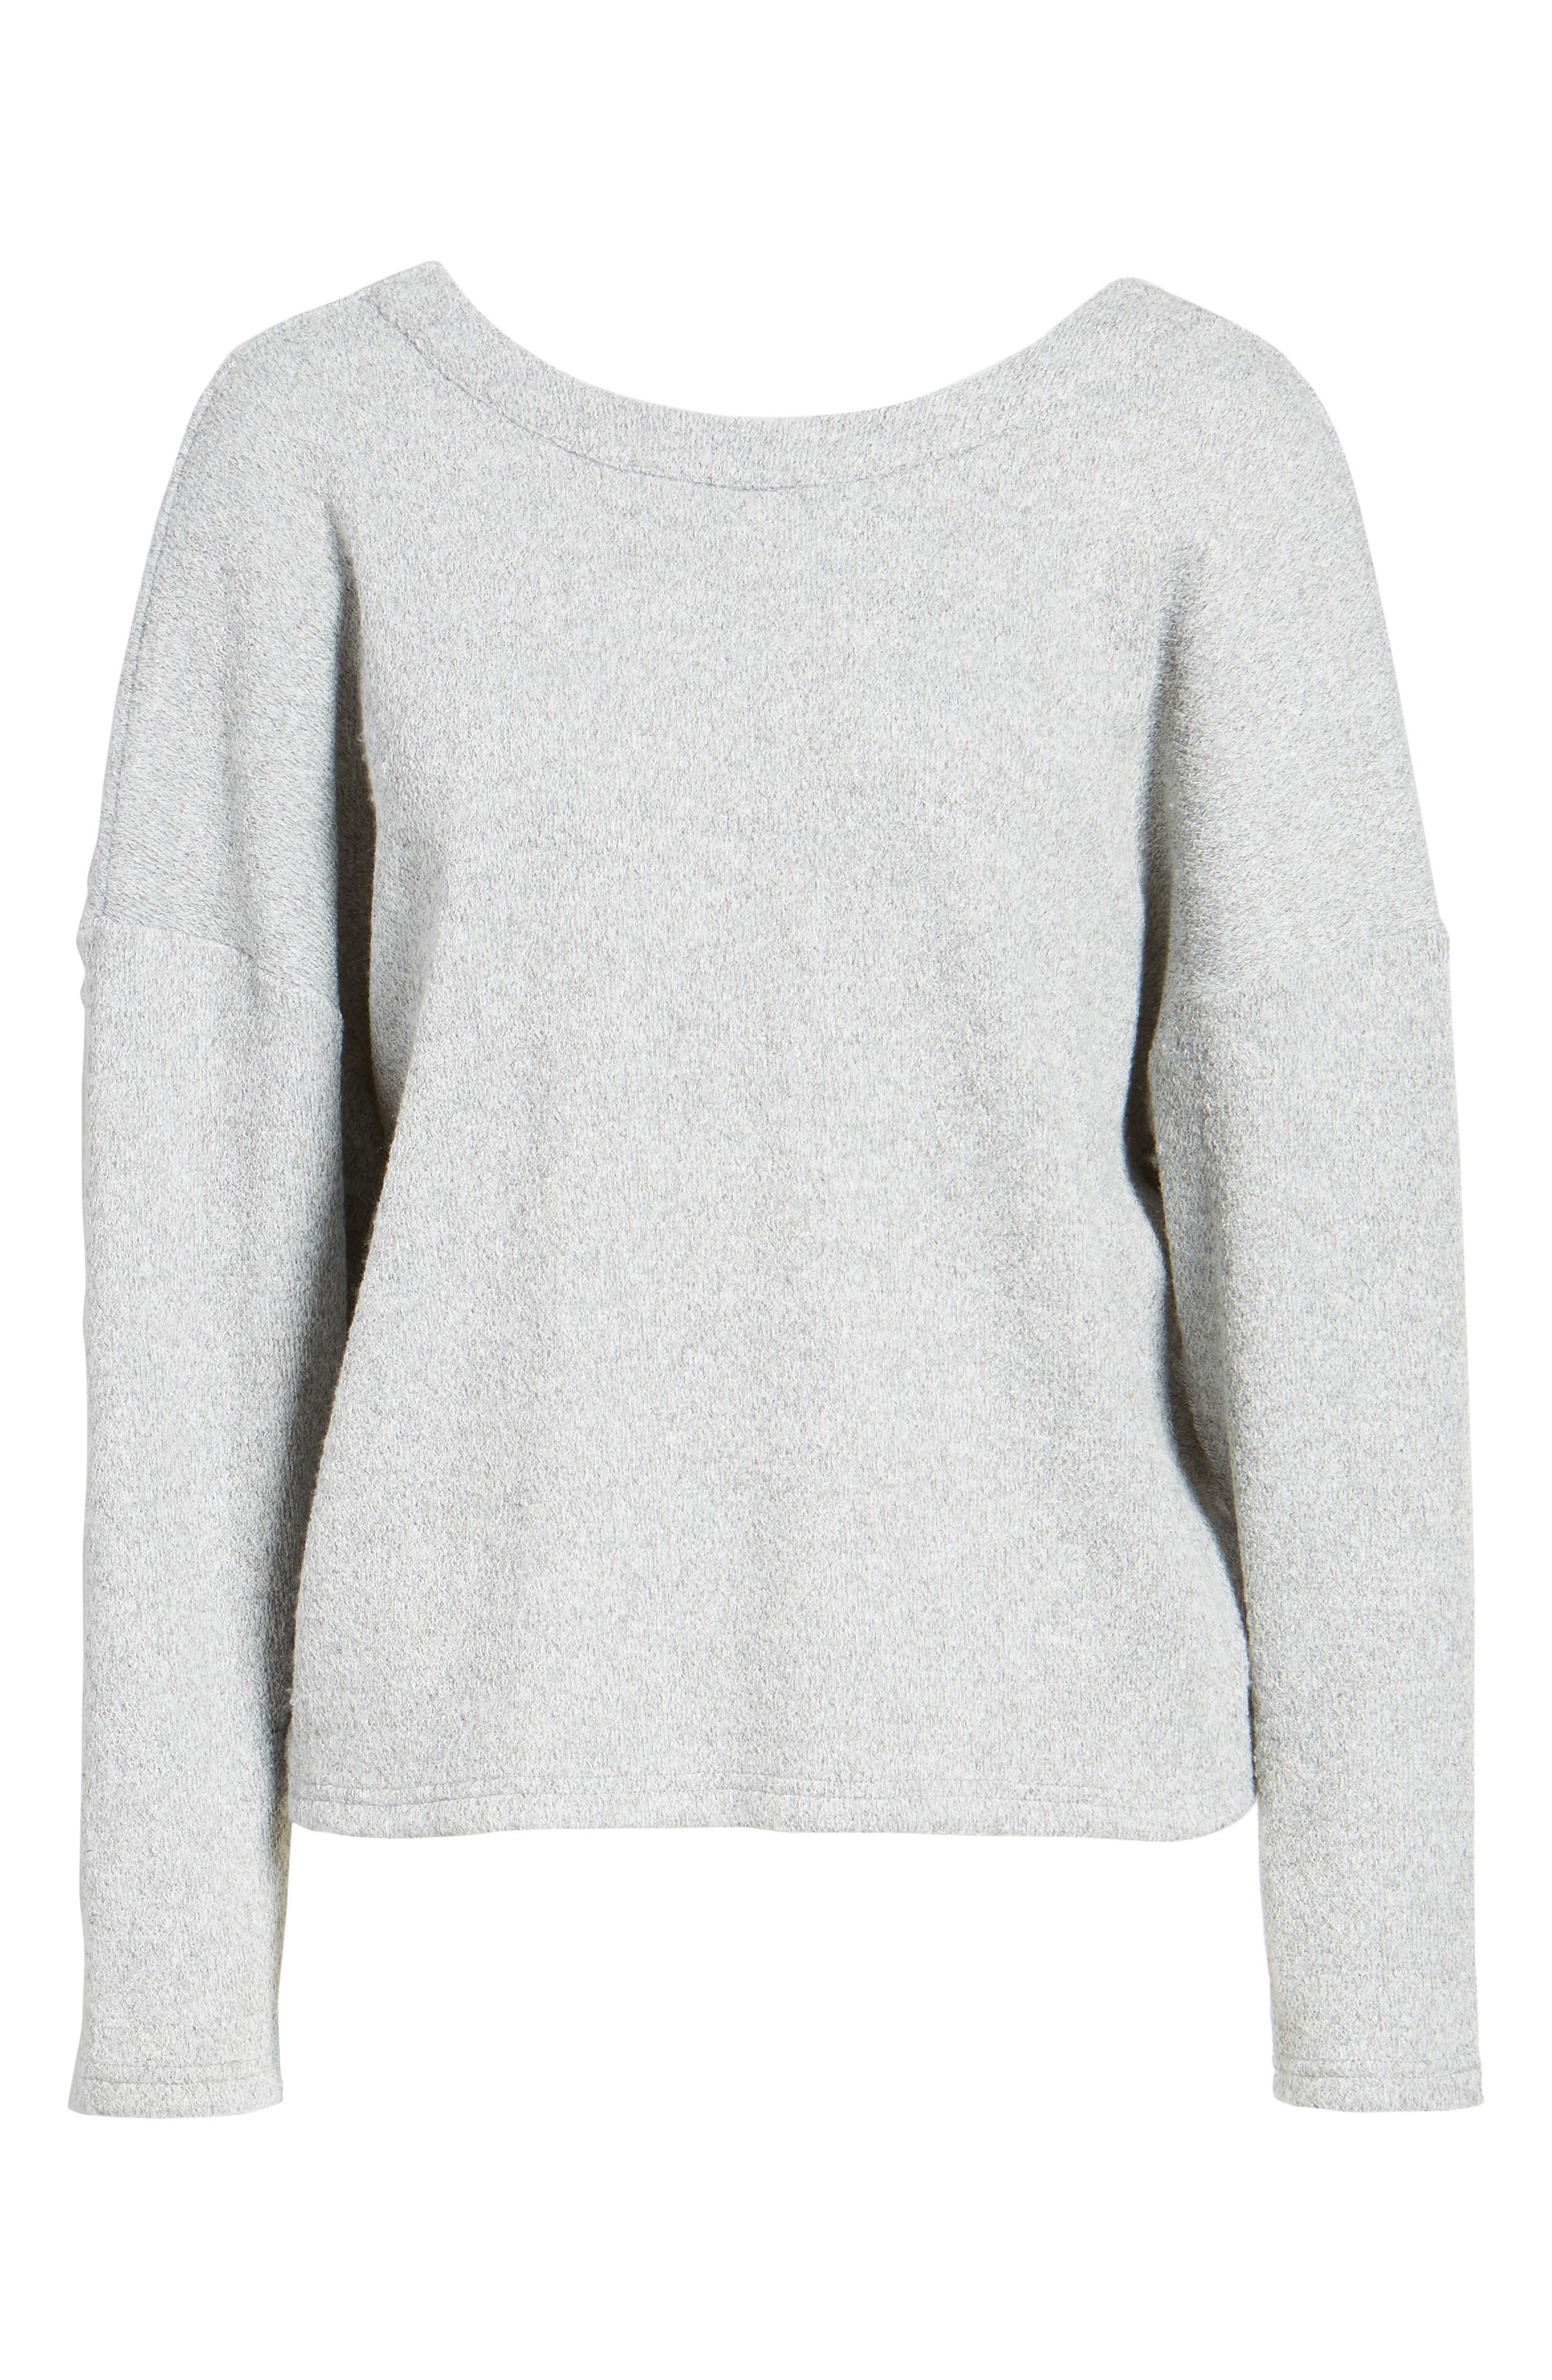 Knot Back Sweatshirt,                             Alternate thumbnail 6, color,                             020